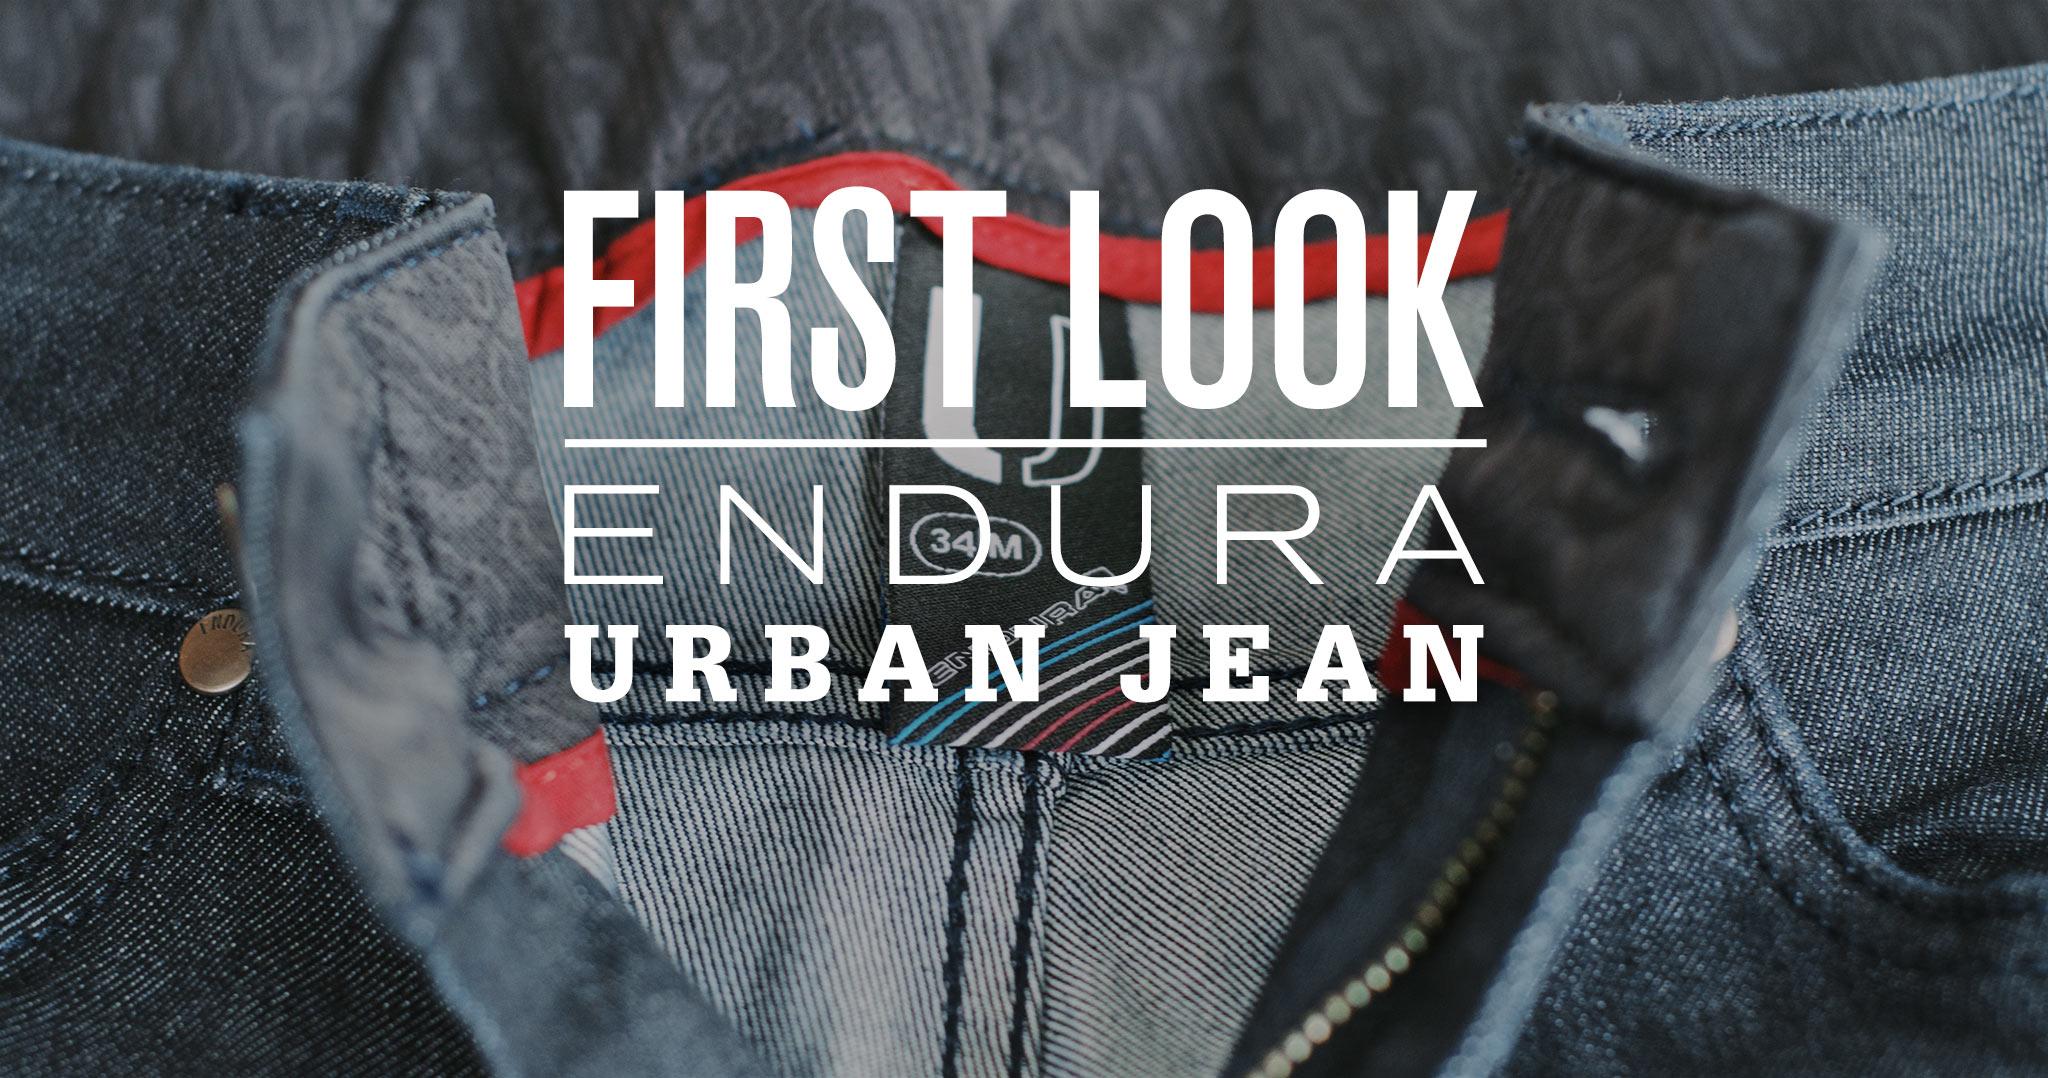 First Look: Endura Urban Jean